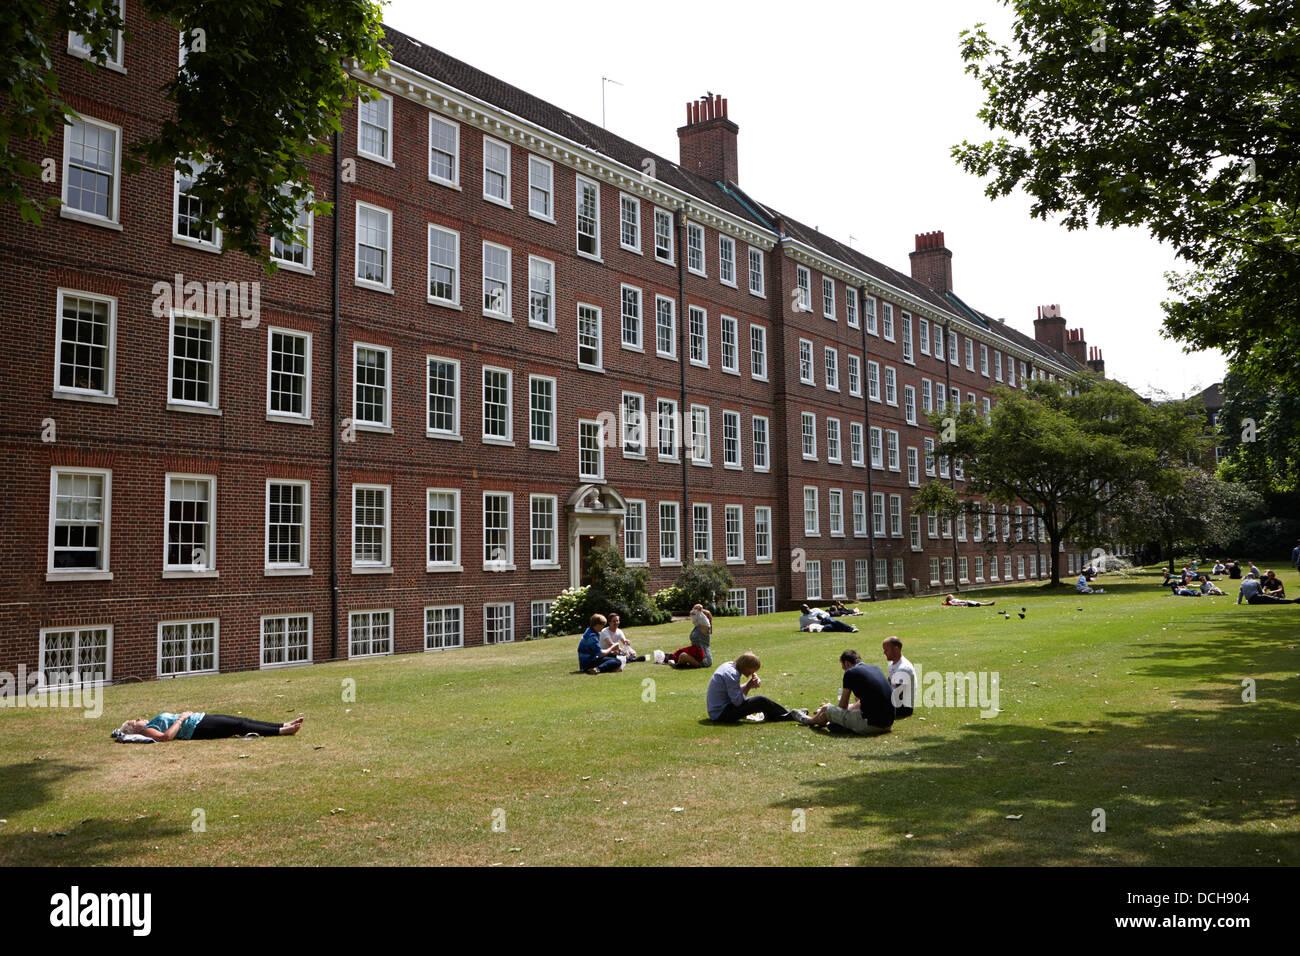 grays inn field and gardens London England UK - Stock Image